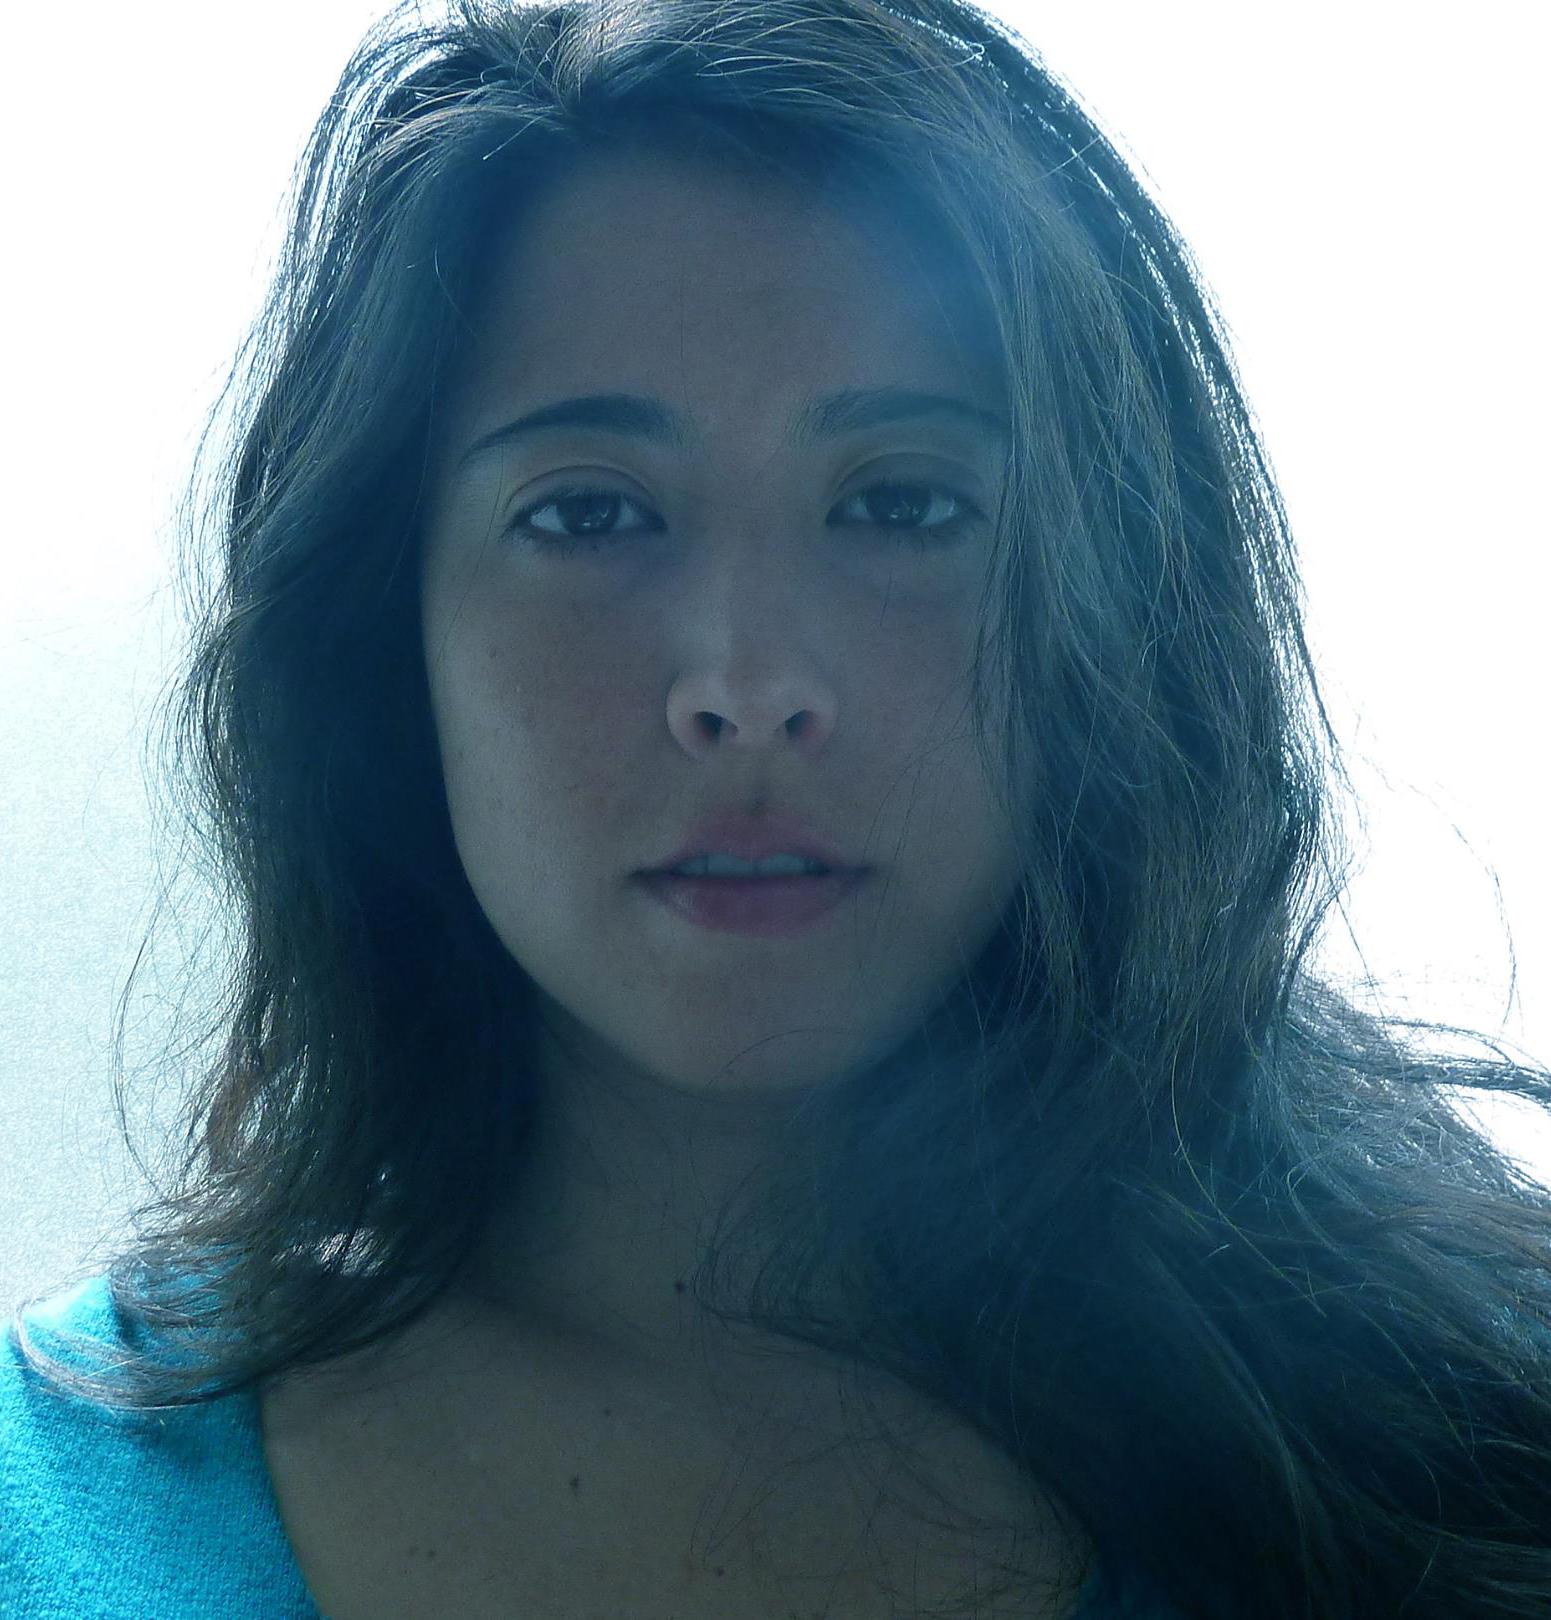 Elisa Ohtake